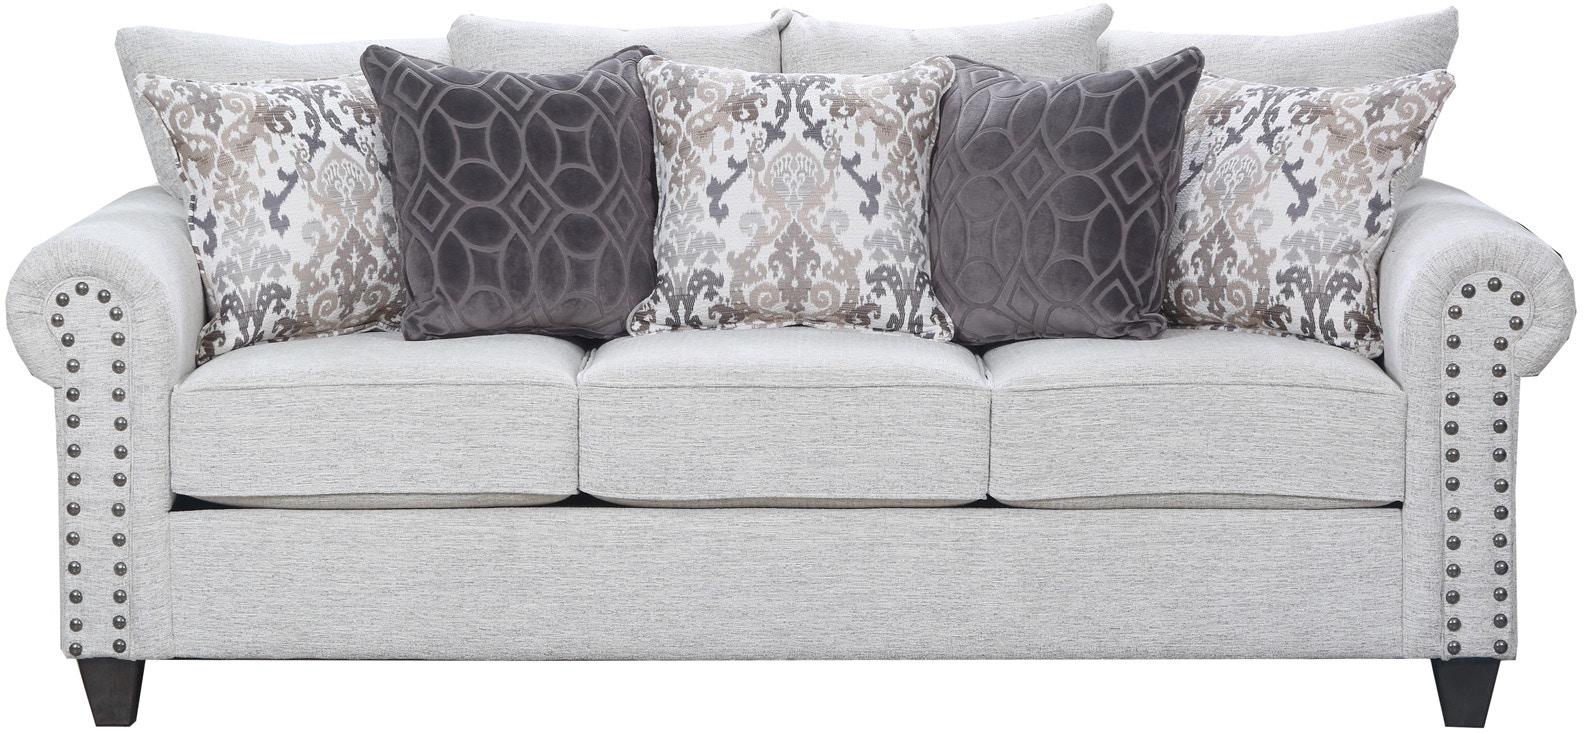 Simmons Upholstery Living Room Della Sofa 056699 - Furniture Fair ...